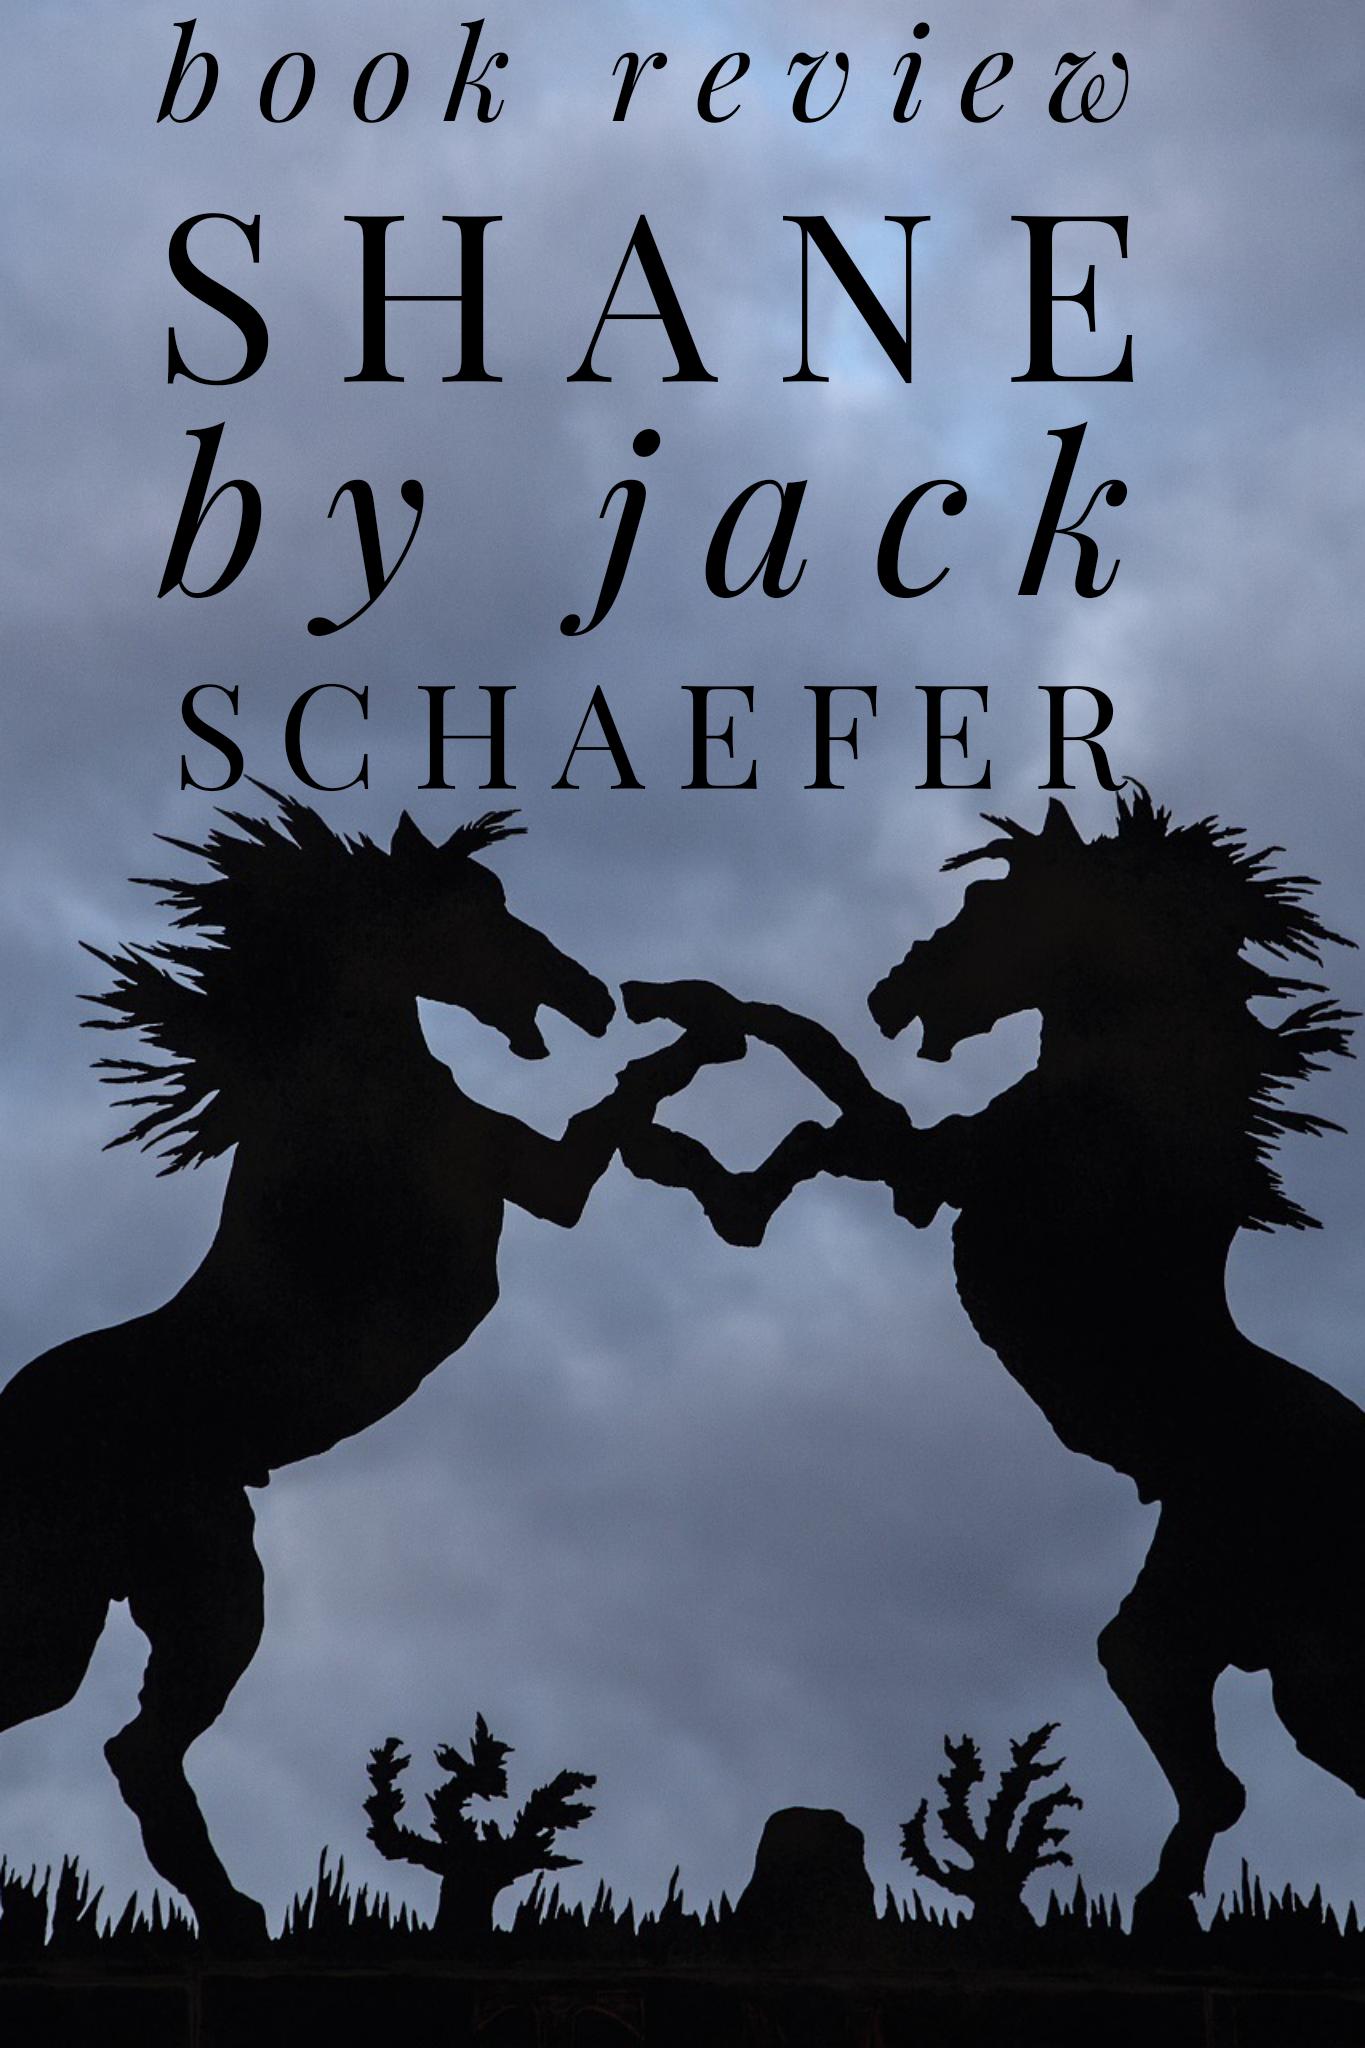 Shane by Jack Schaefer, shane summary, shane review